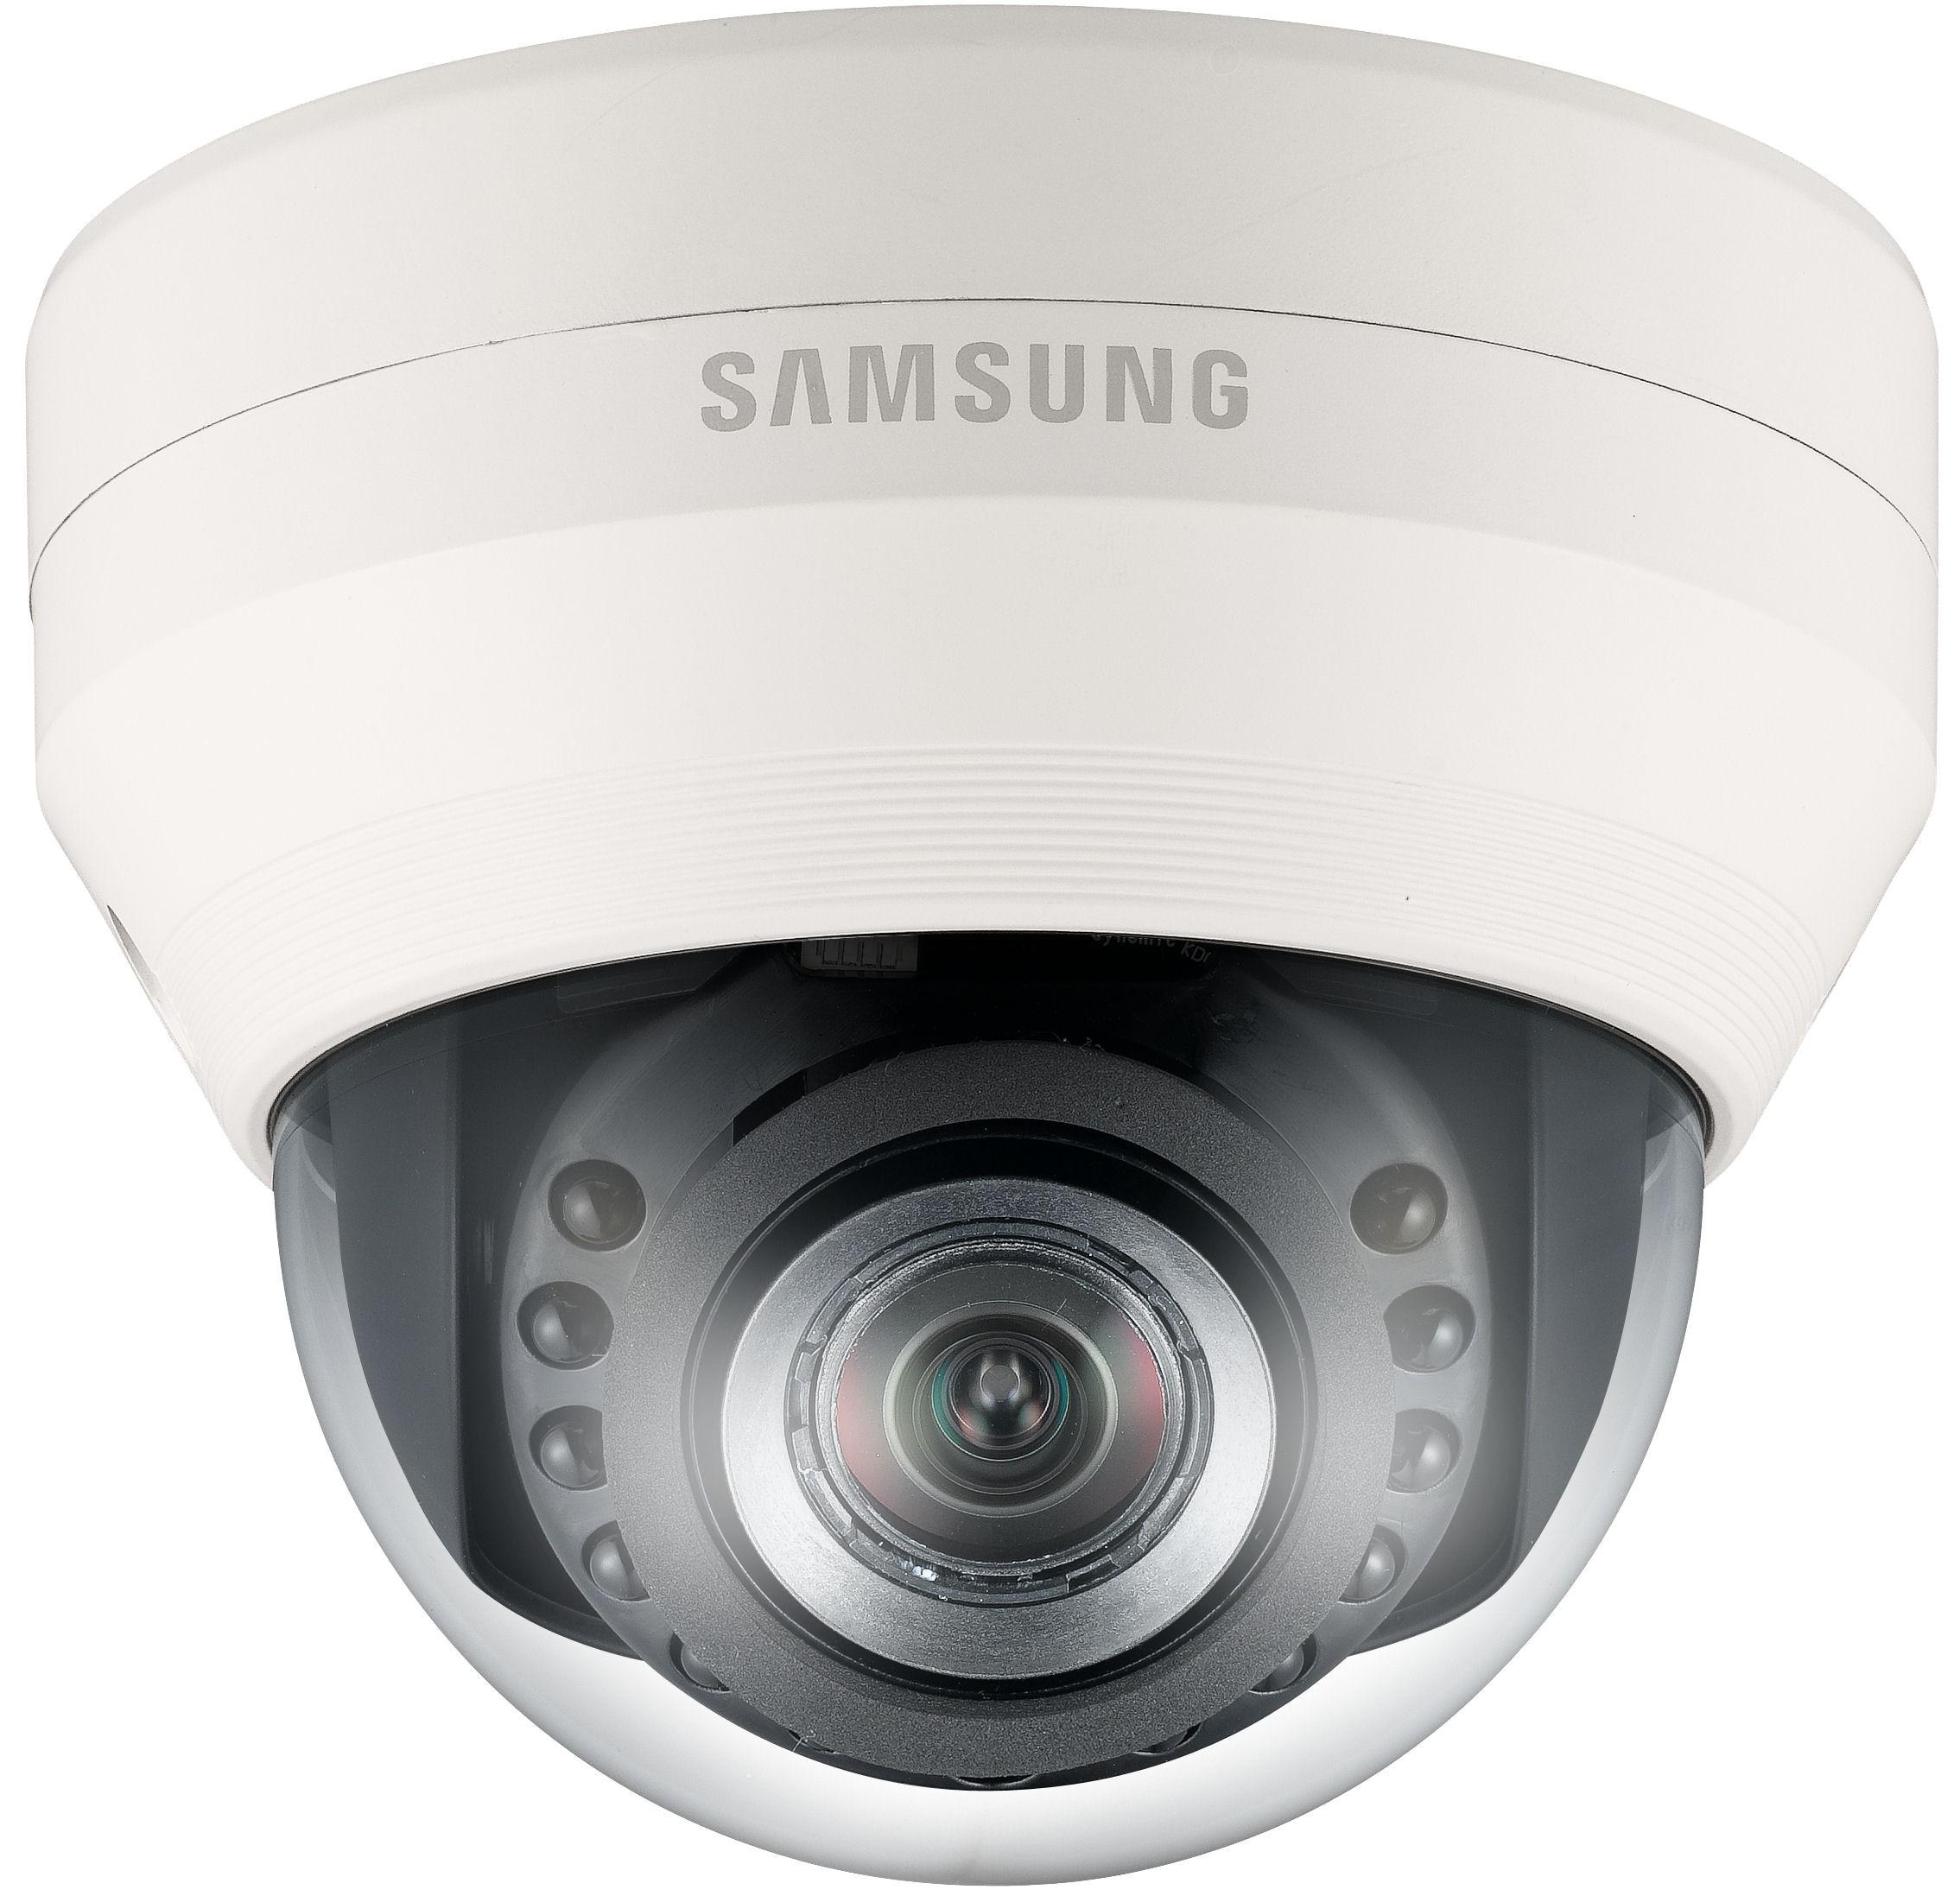 Samsung / Hanwha SND7084RP 3 Megapixel Network IR Dome Camera